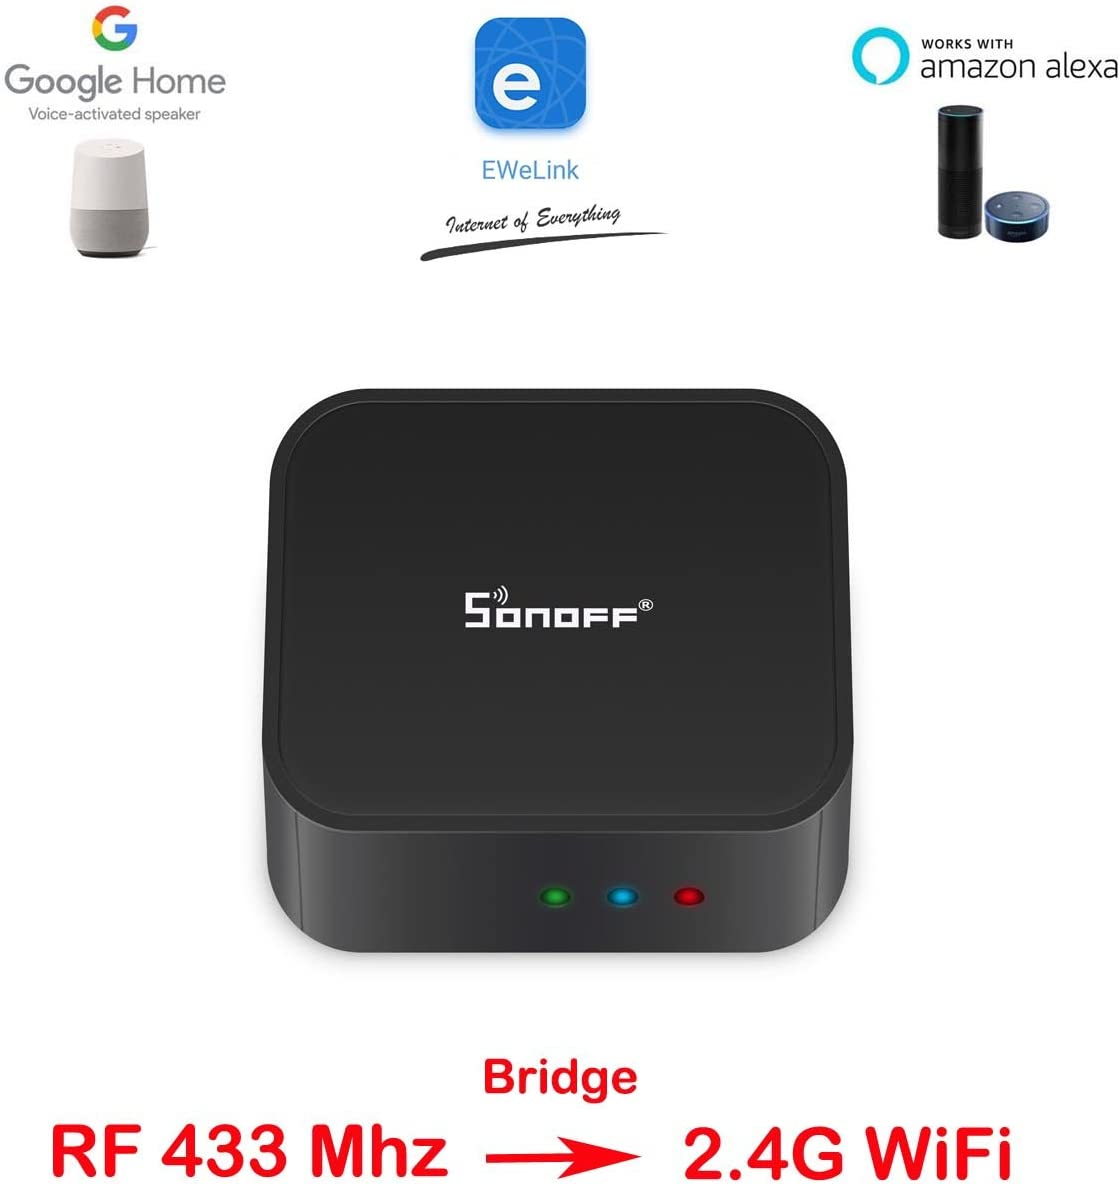 X 2 PCS) Sonoff PIR 433 Mhz Wireless Dual Infrared Human Sensor for Smart Home Automation Security Alarm System,work with RF 433 Bridge via EWeLink App